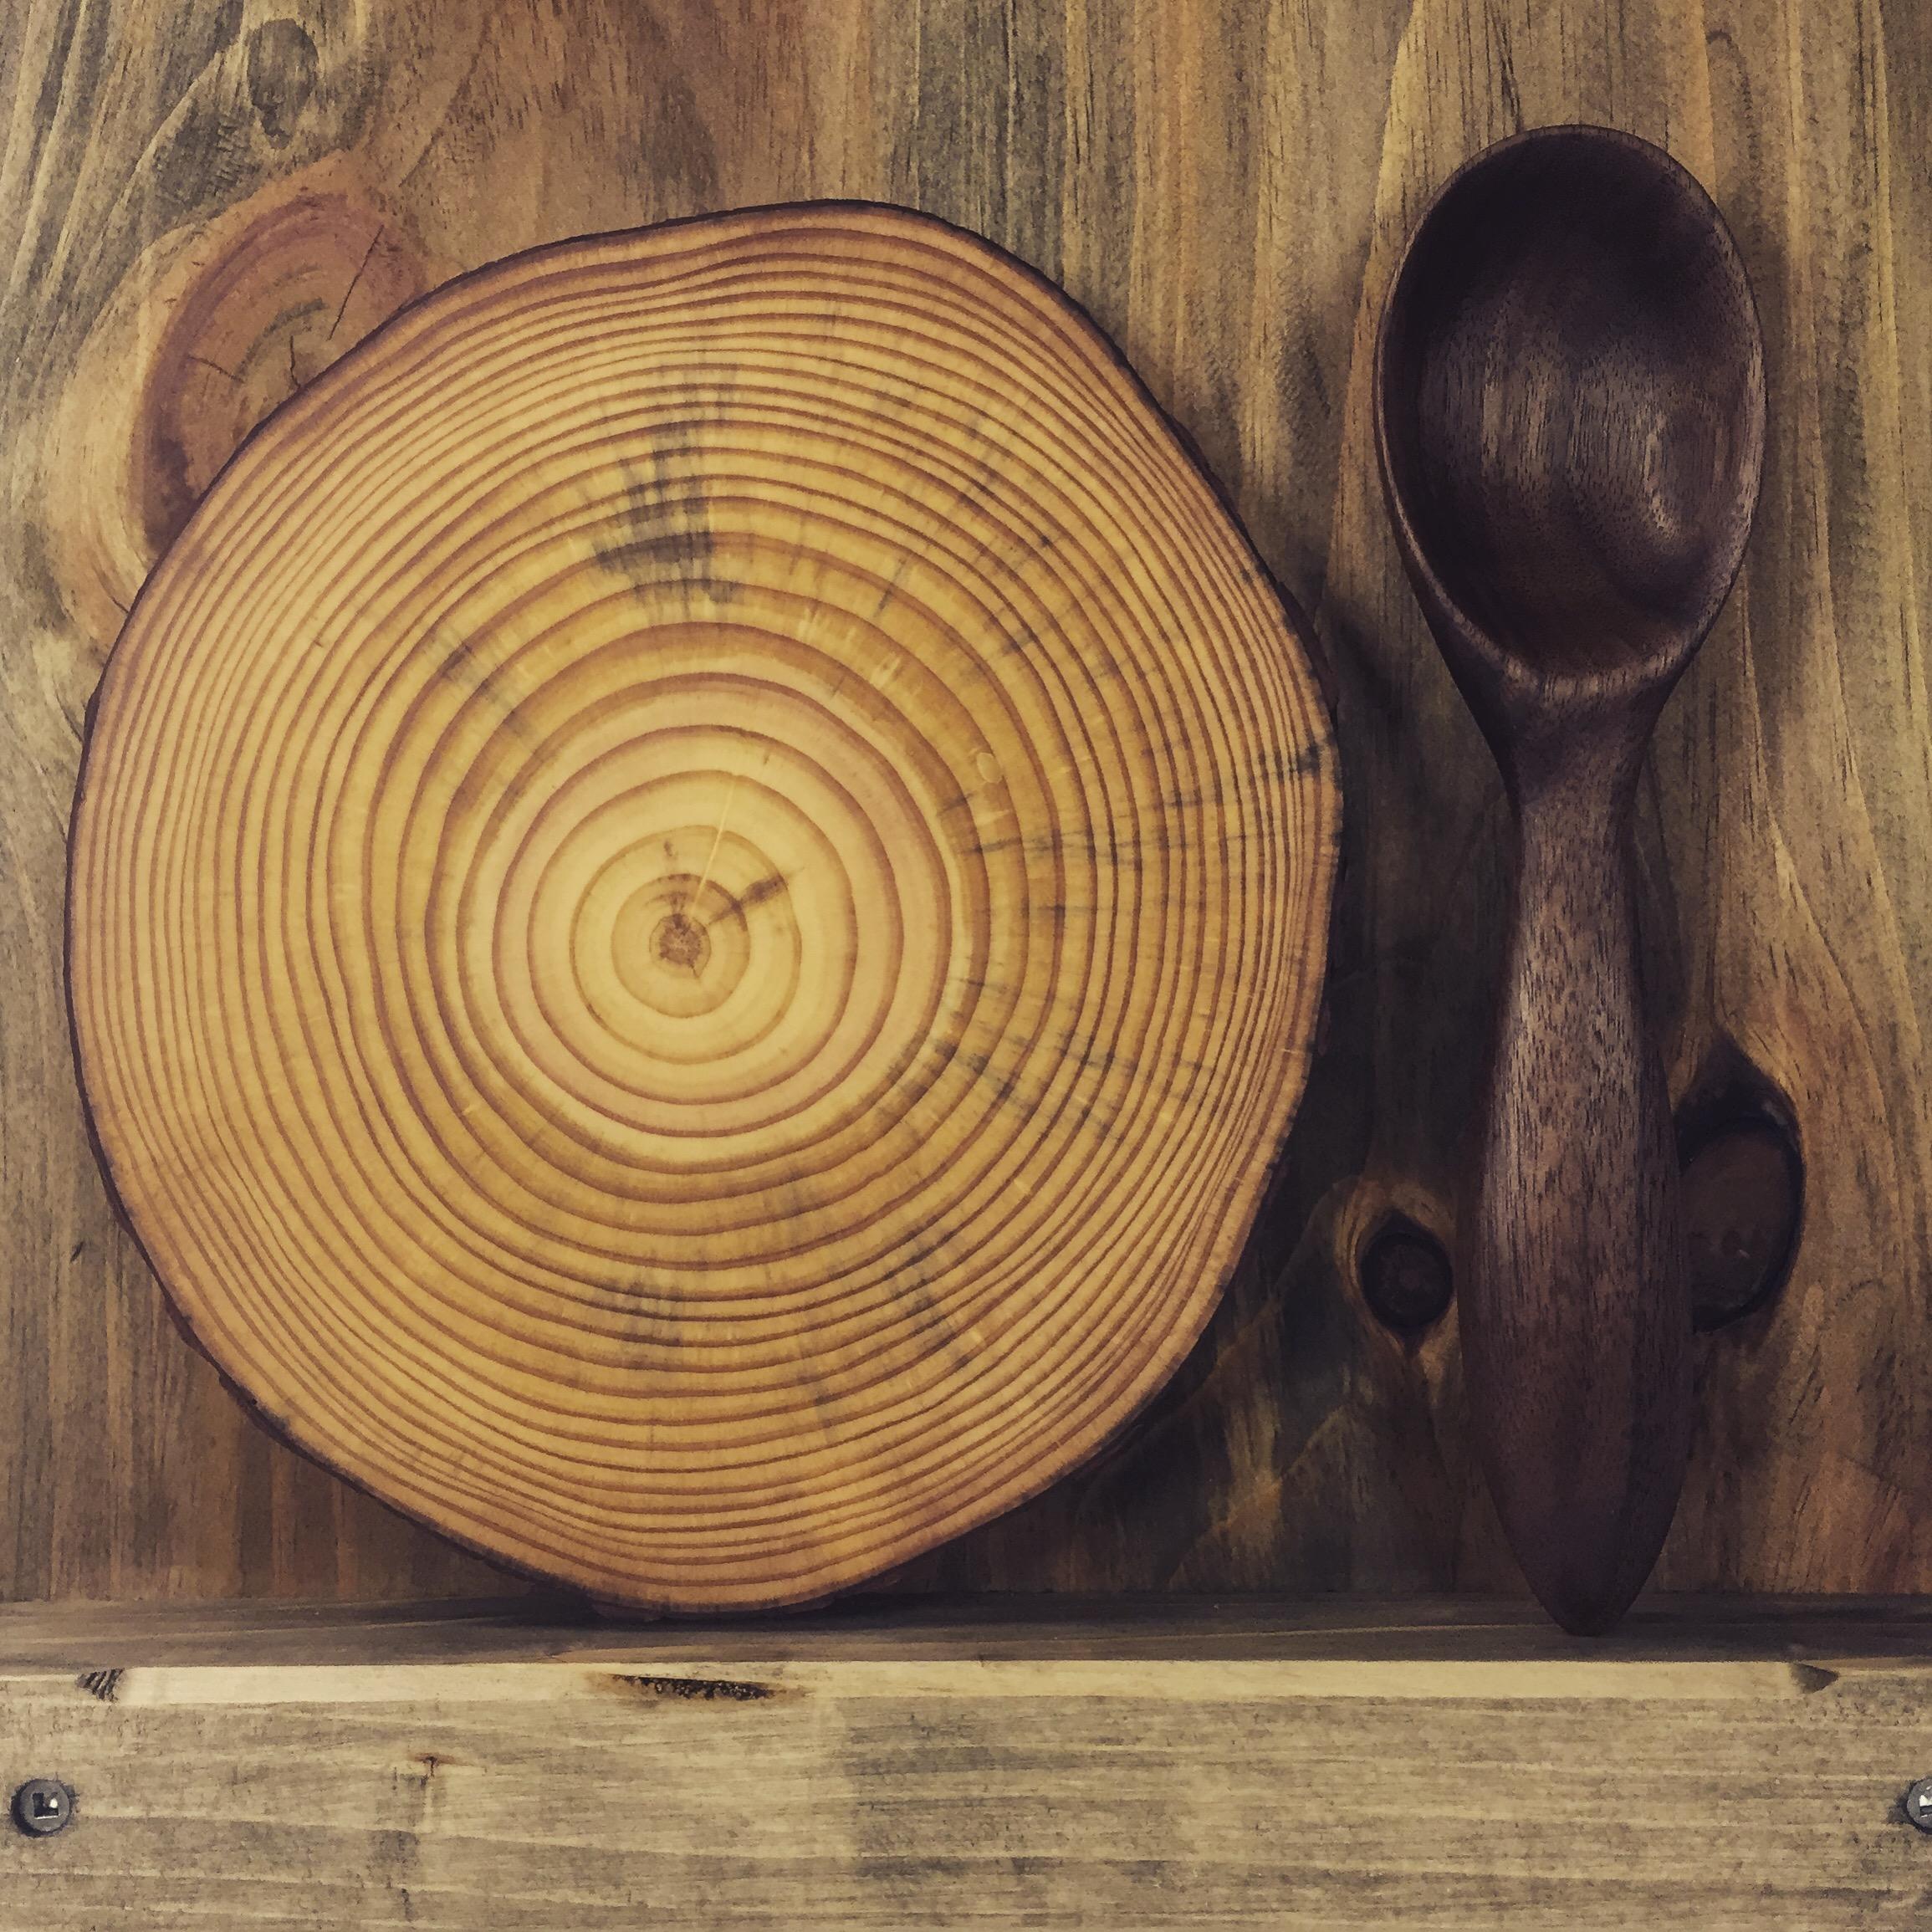 Cabin Kitchenware